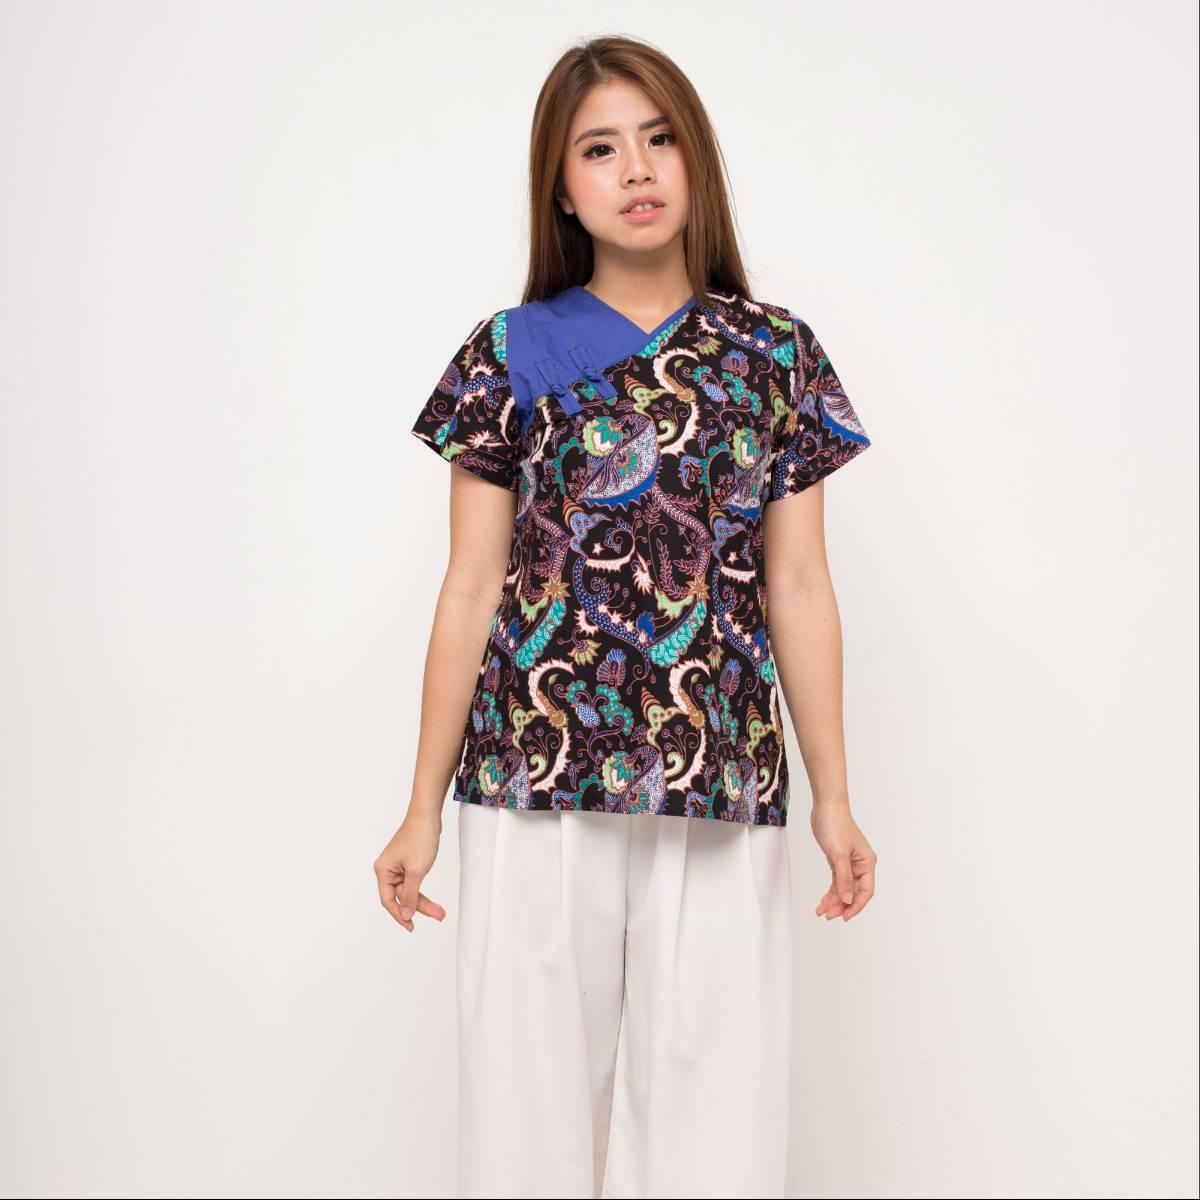 Batik Wanita-Cynthia Top1